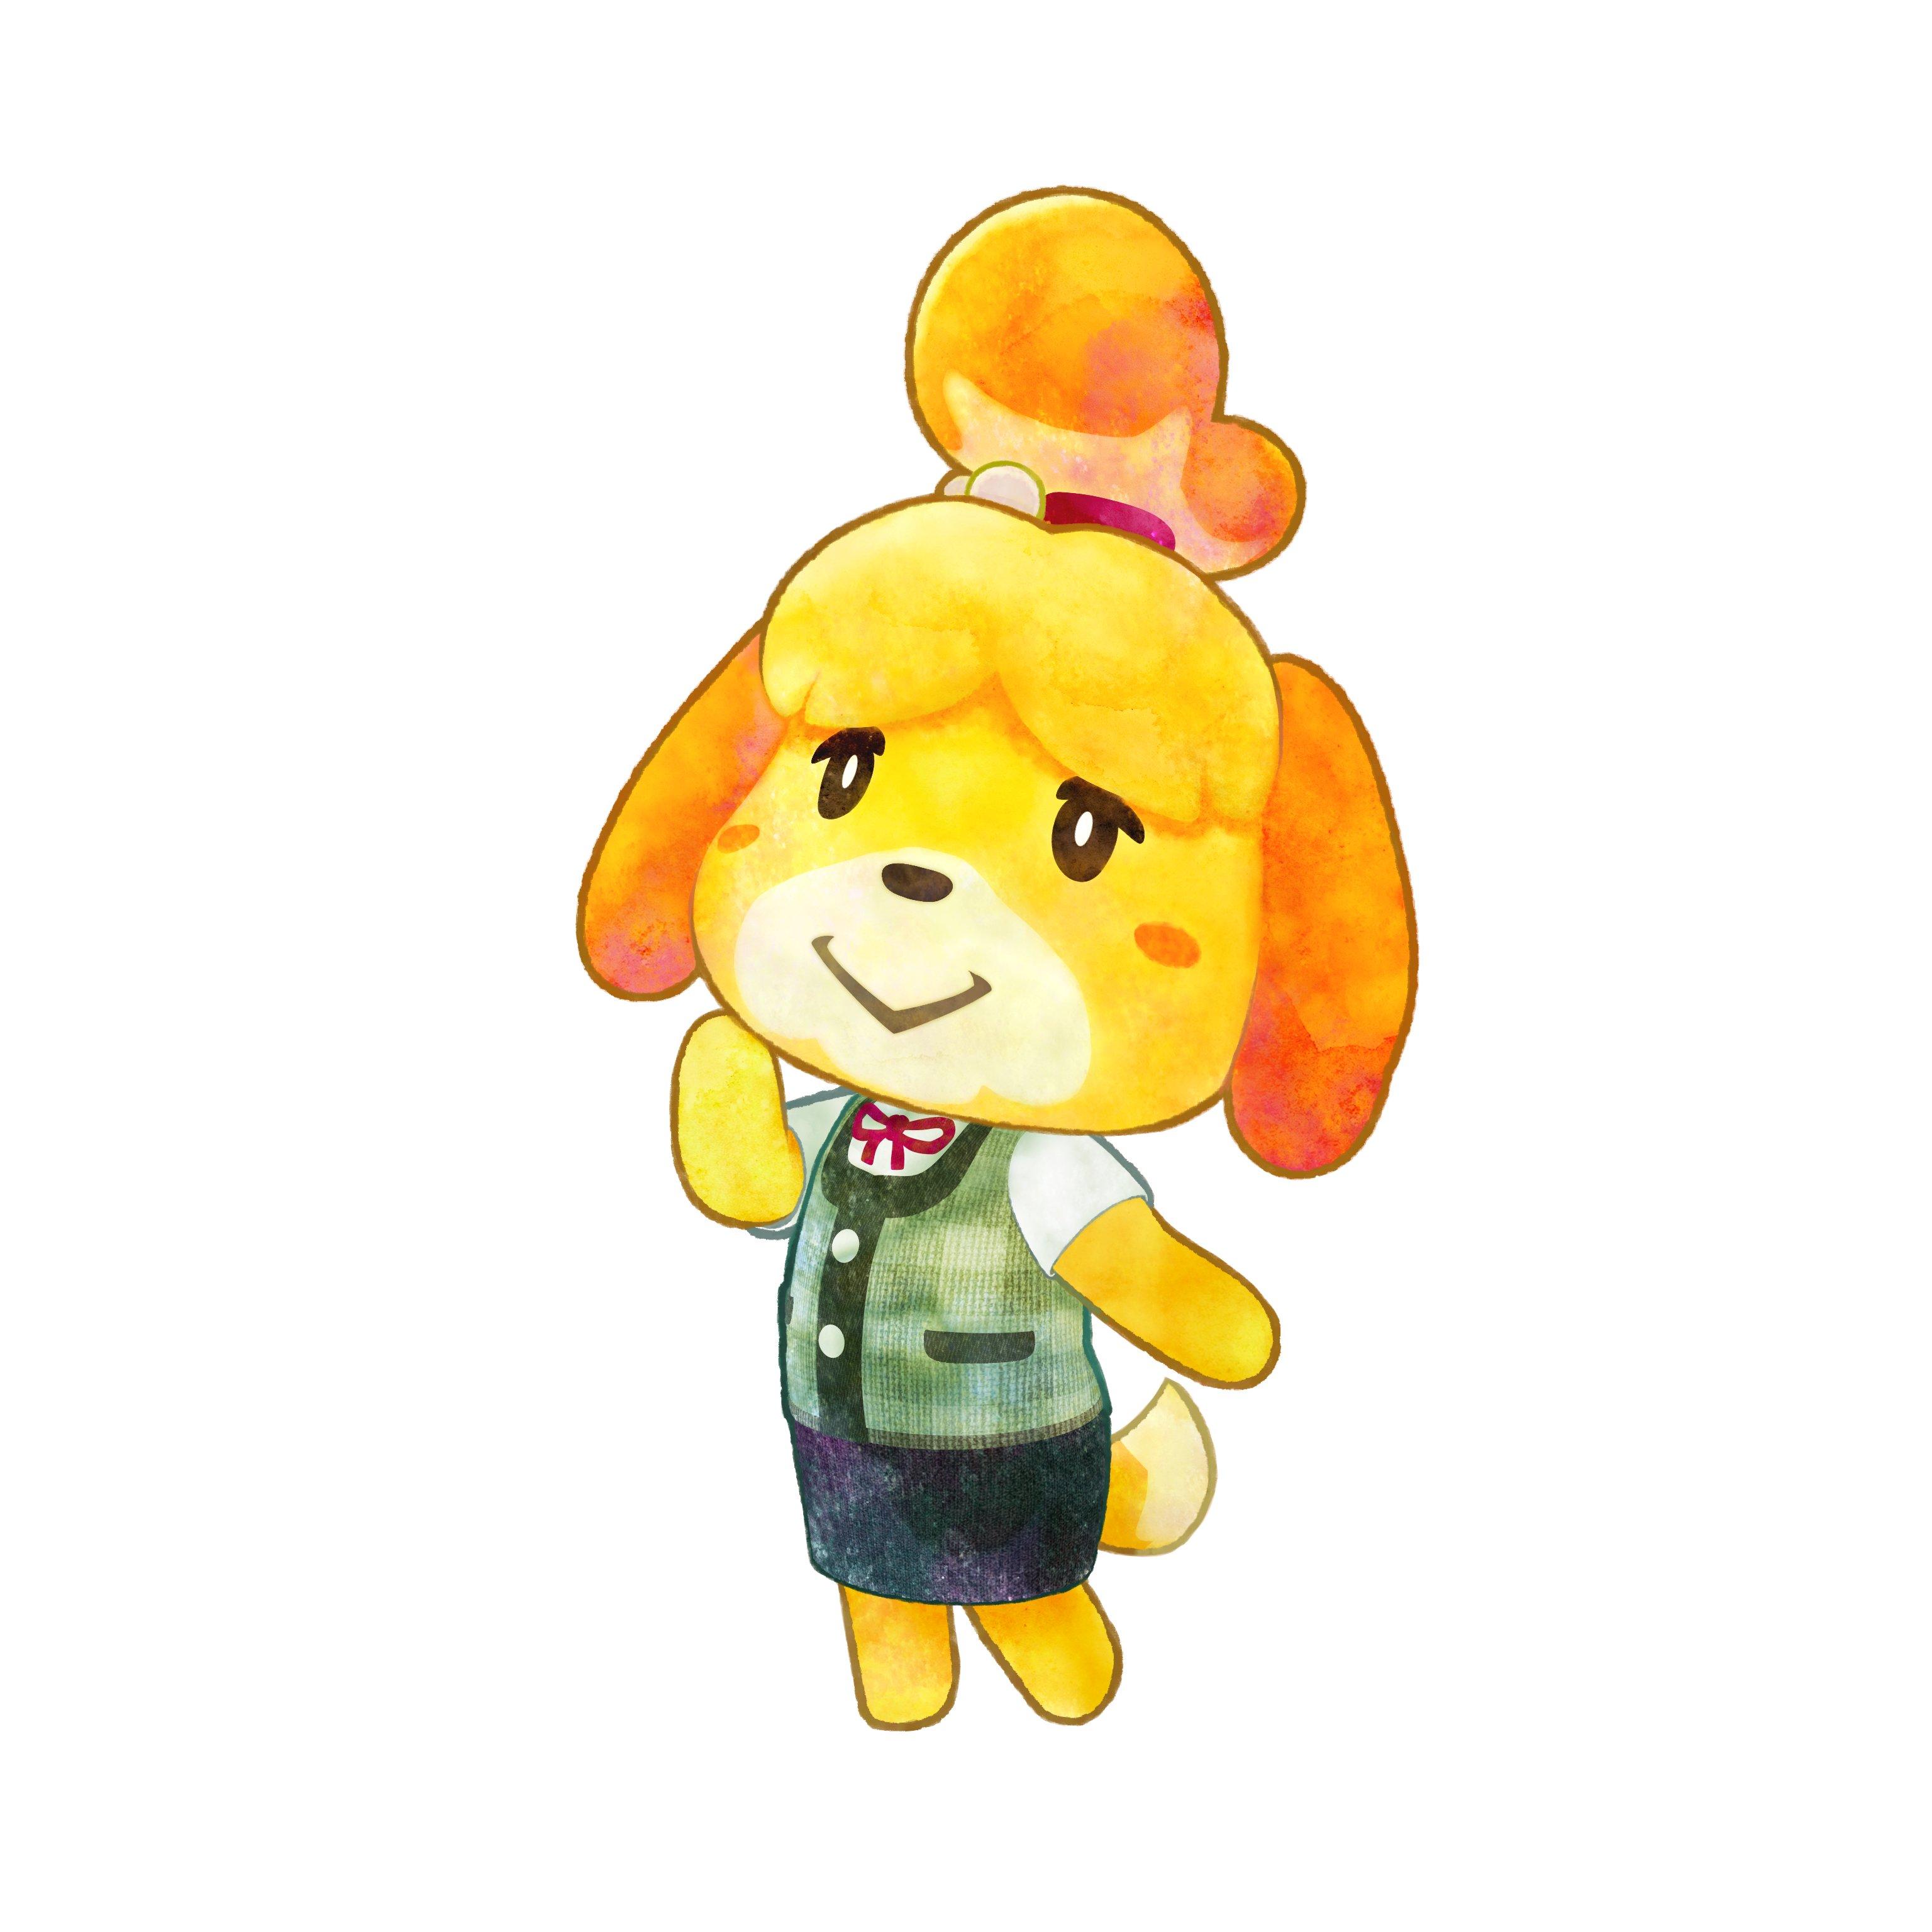 Animal Crossing Happy Home Designer Initial Release Date